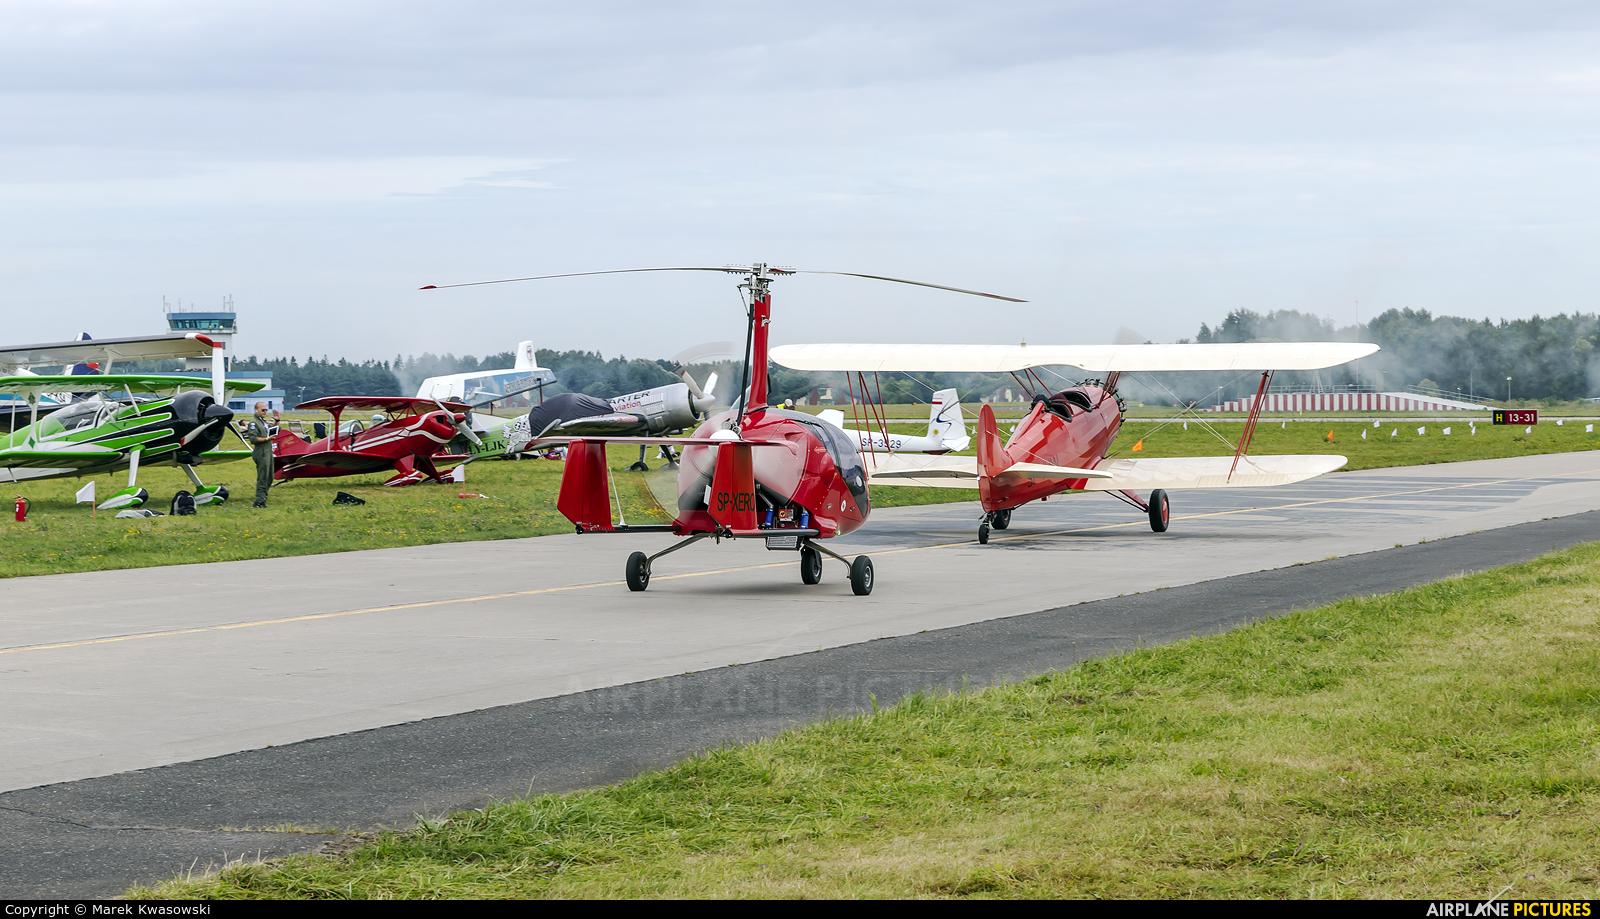 Private SP-XERO aircraft at Gdynia- Babie Doły (Oksywie)